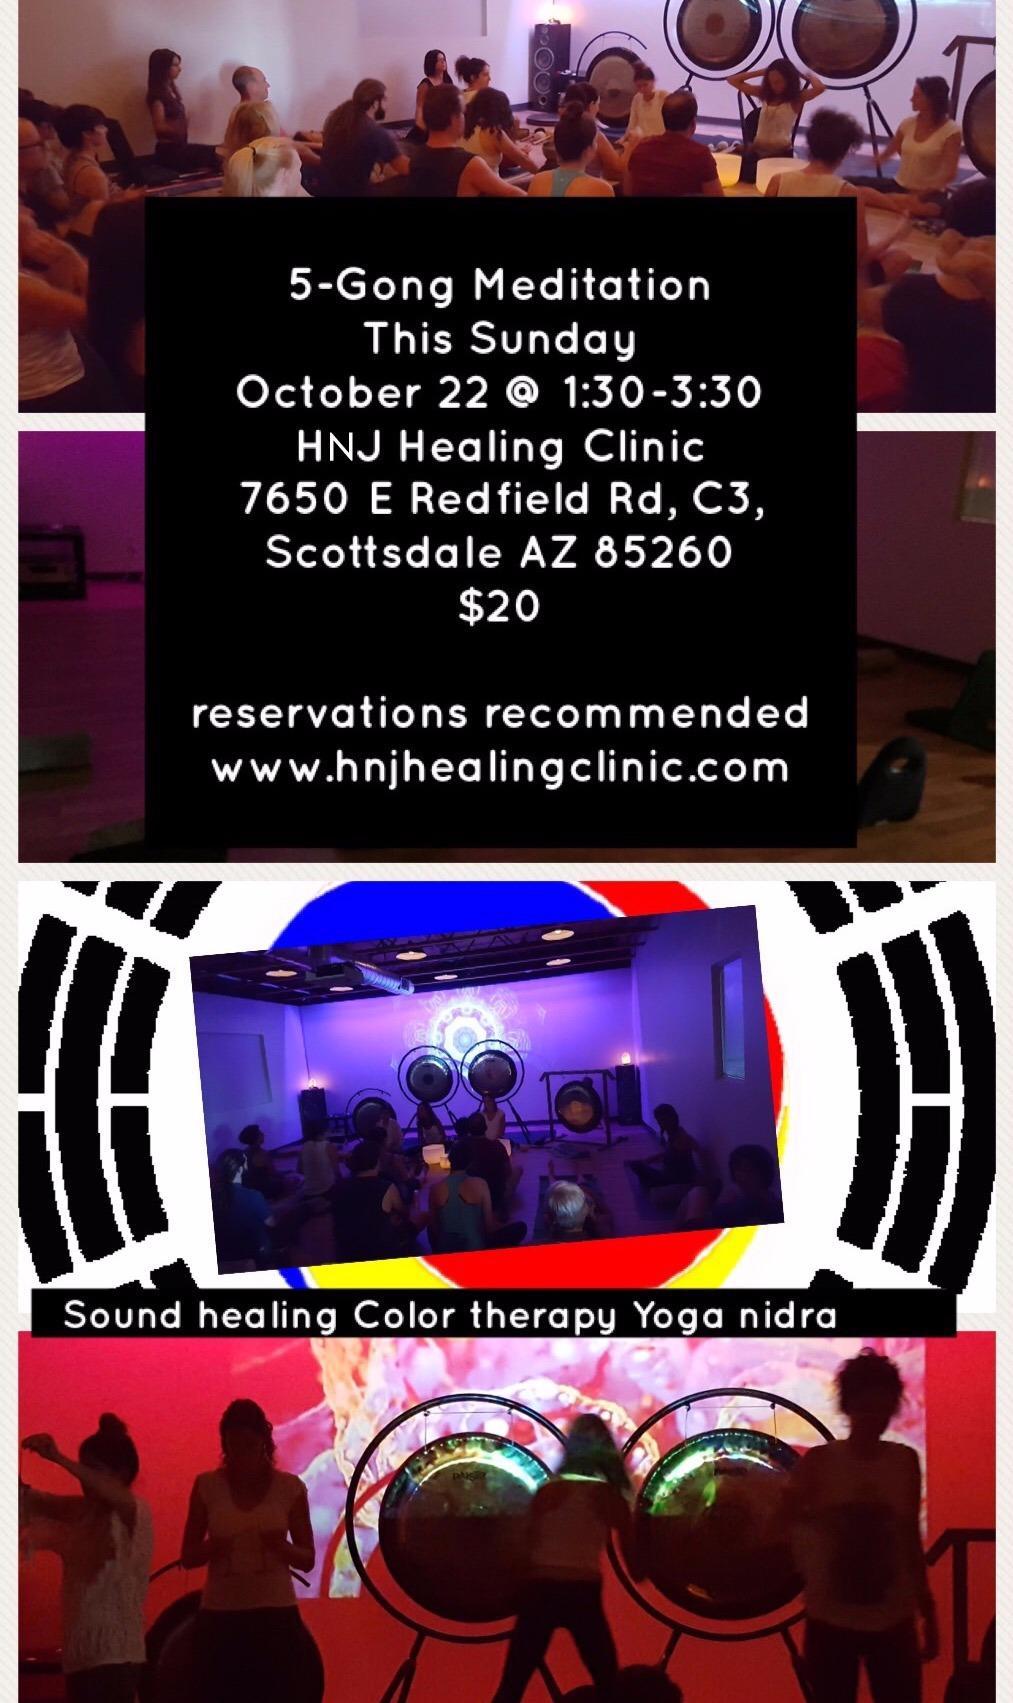 HNJ Healing Clinic image 73